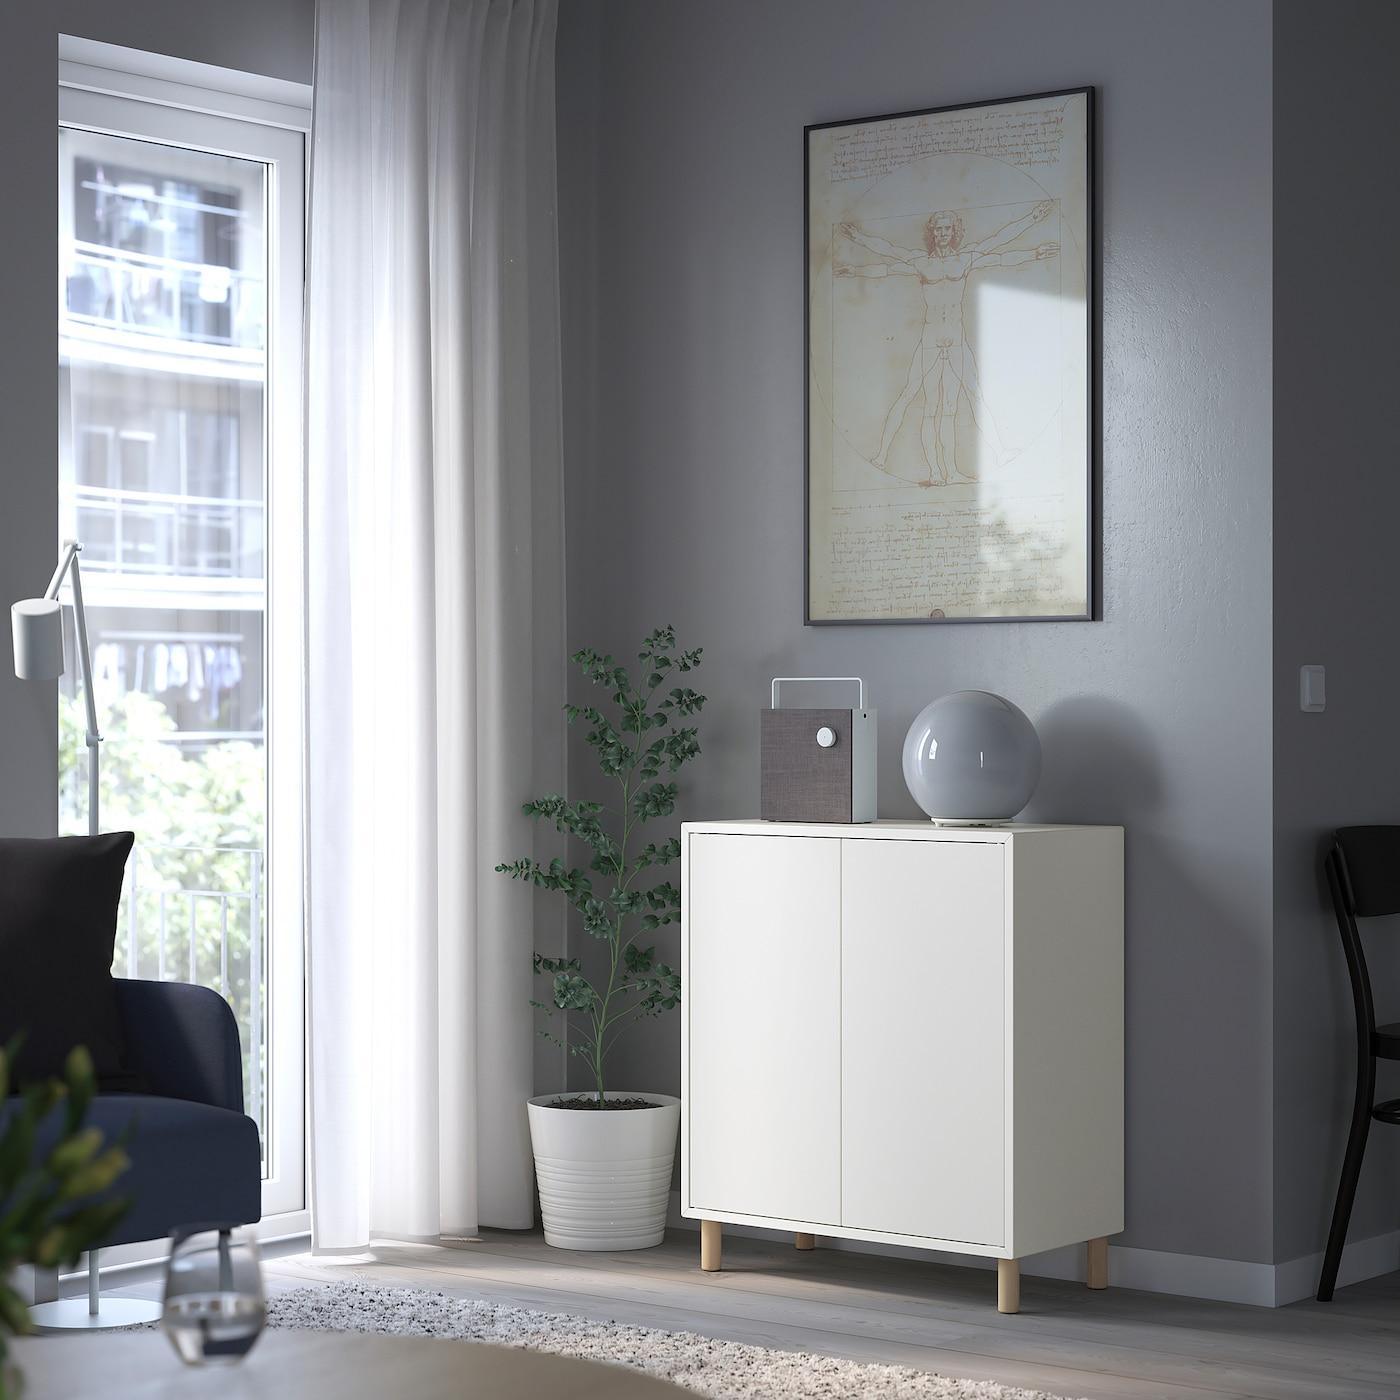 EKET Cabinet w 2 doors and 2 shelves, white, 70x25x70 cm